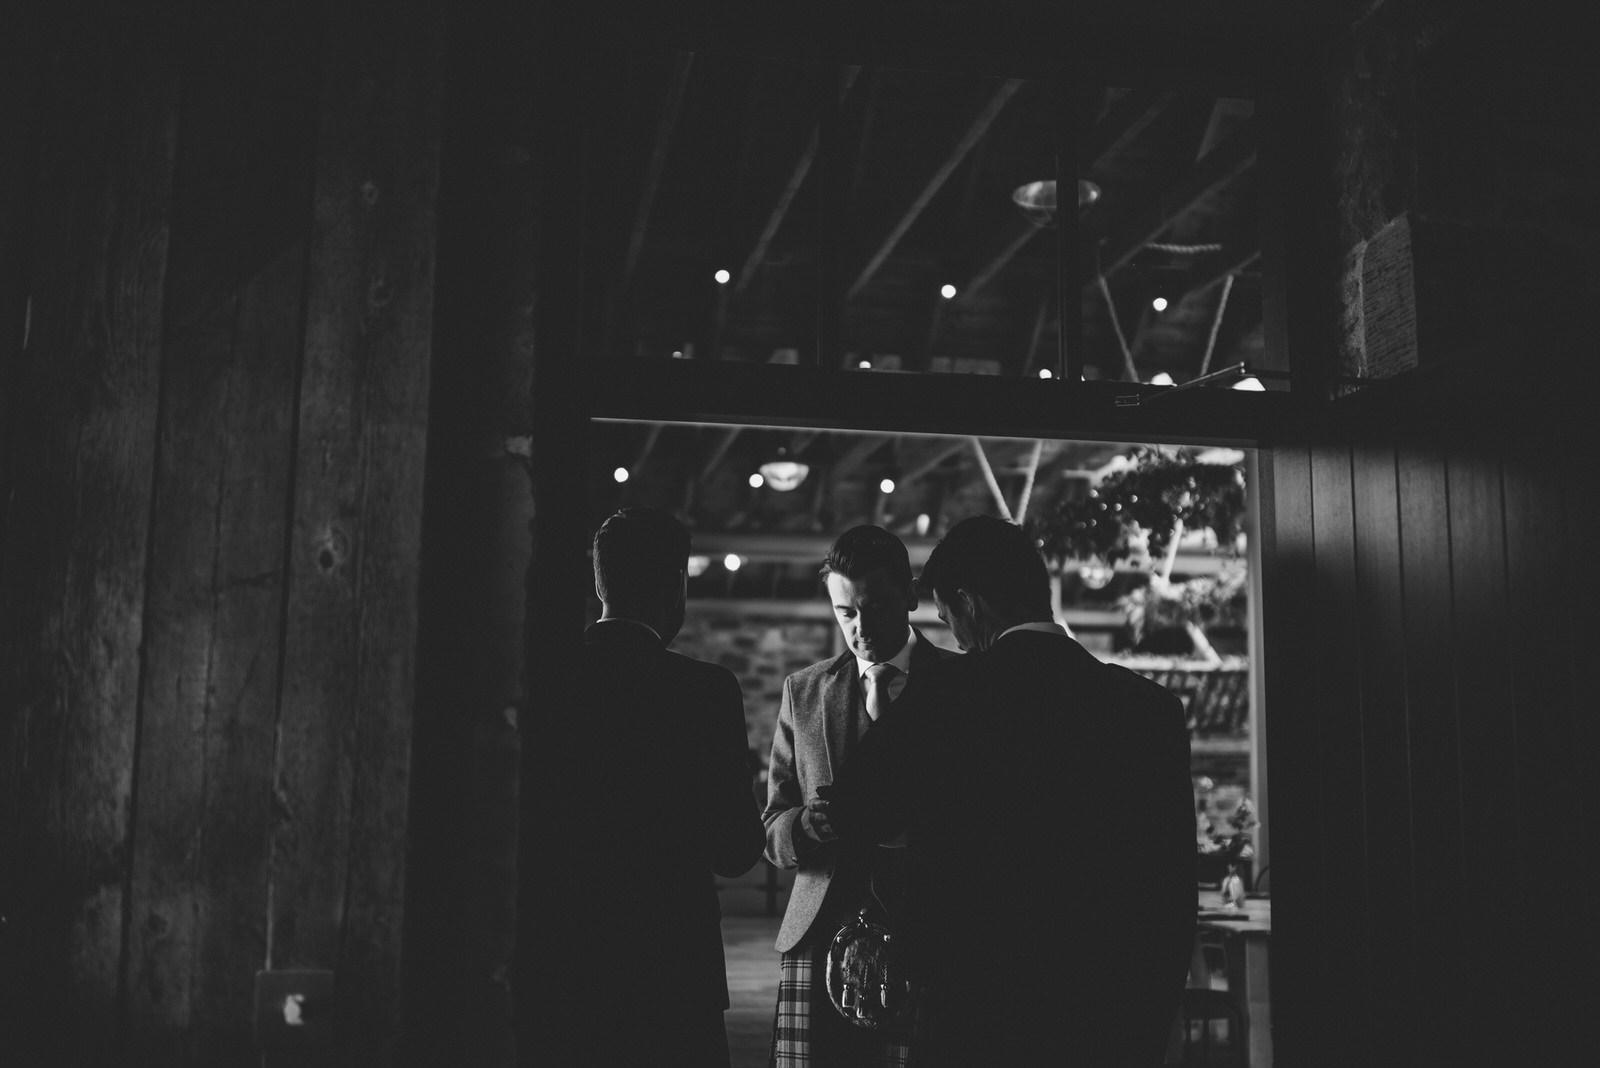 011-GUARDSWELL-FARM-WEDDING-ALTERNATIVE-SCOTTISH-WEDDING-PHOTOGRAPHER-SCOTTISH-WEDDING-DESTINATION-WEDDING-PHOTOGRAPHER.JPG